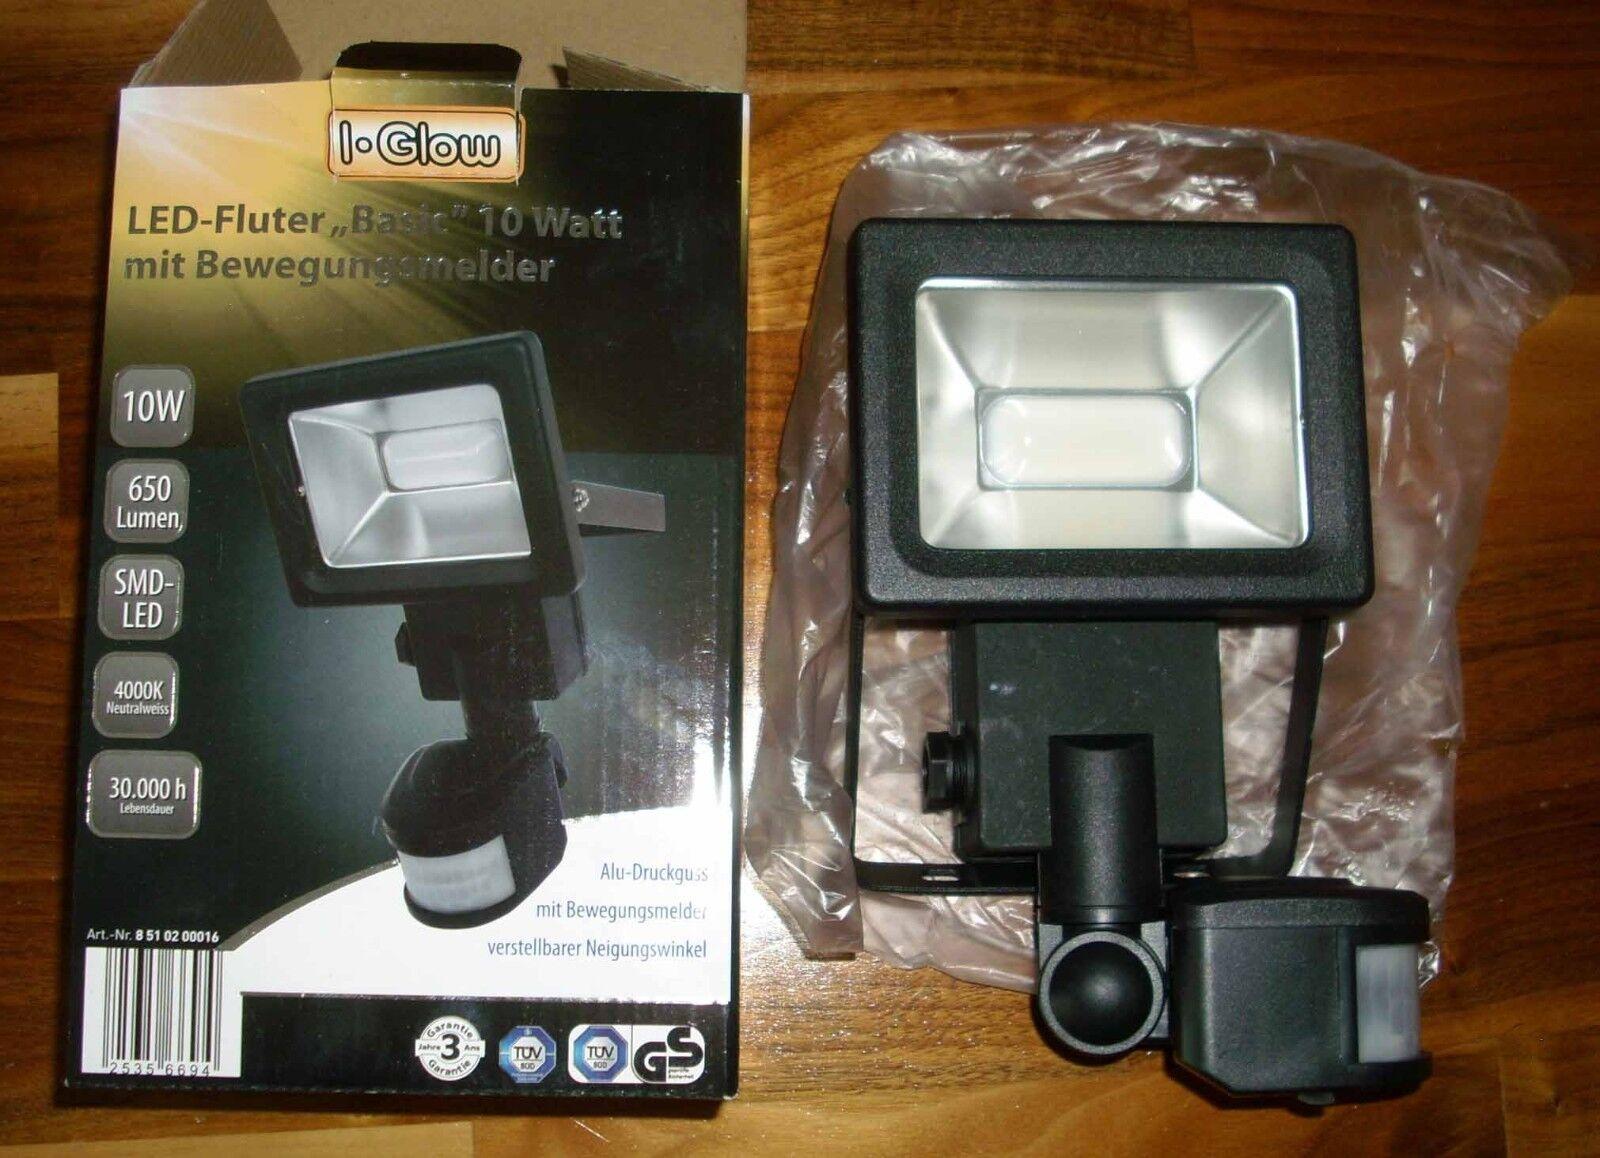 XQ-Lite I-Glow LED-Strahler 10 W Fluter 1x SMD LED mit Bewegungsmelder Schwarz